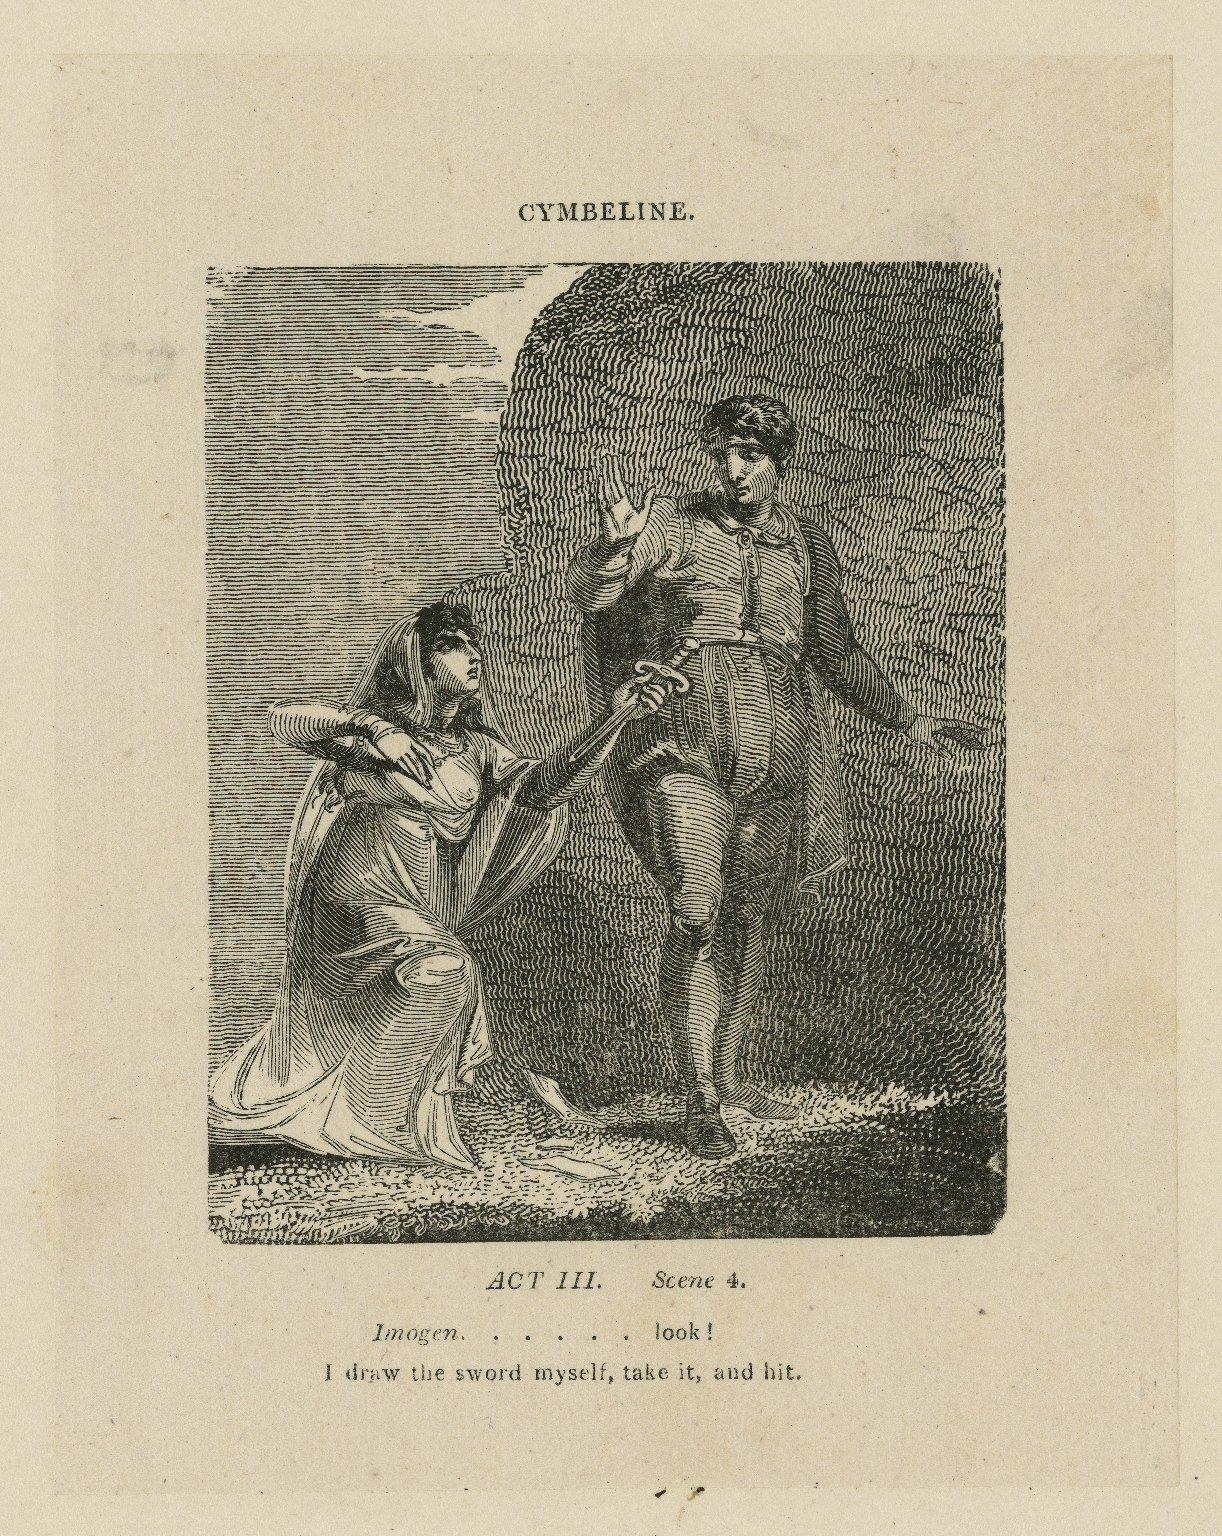 Cymbeline, act III, scene 4, Imogen ... look! I draw the sword myself, take it, and hit [graphic] / [John Thurston] ; engraved by Allen Robert Branston.